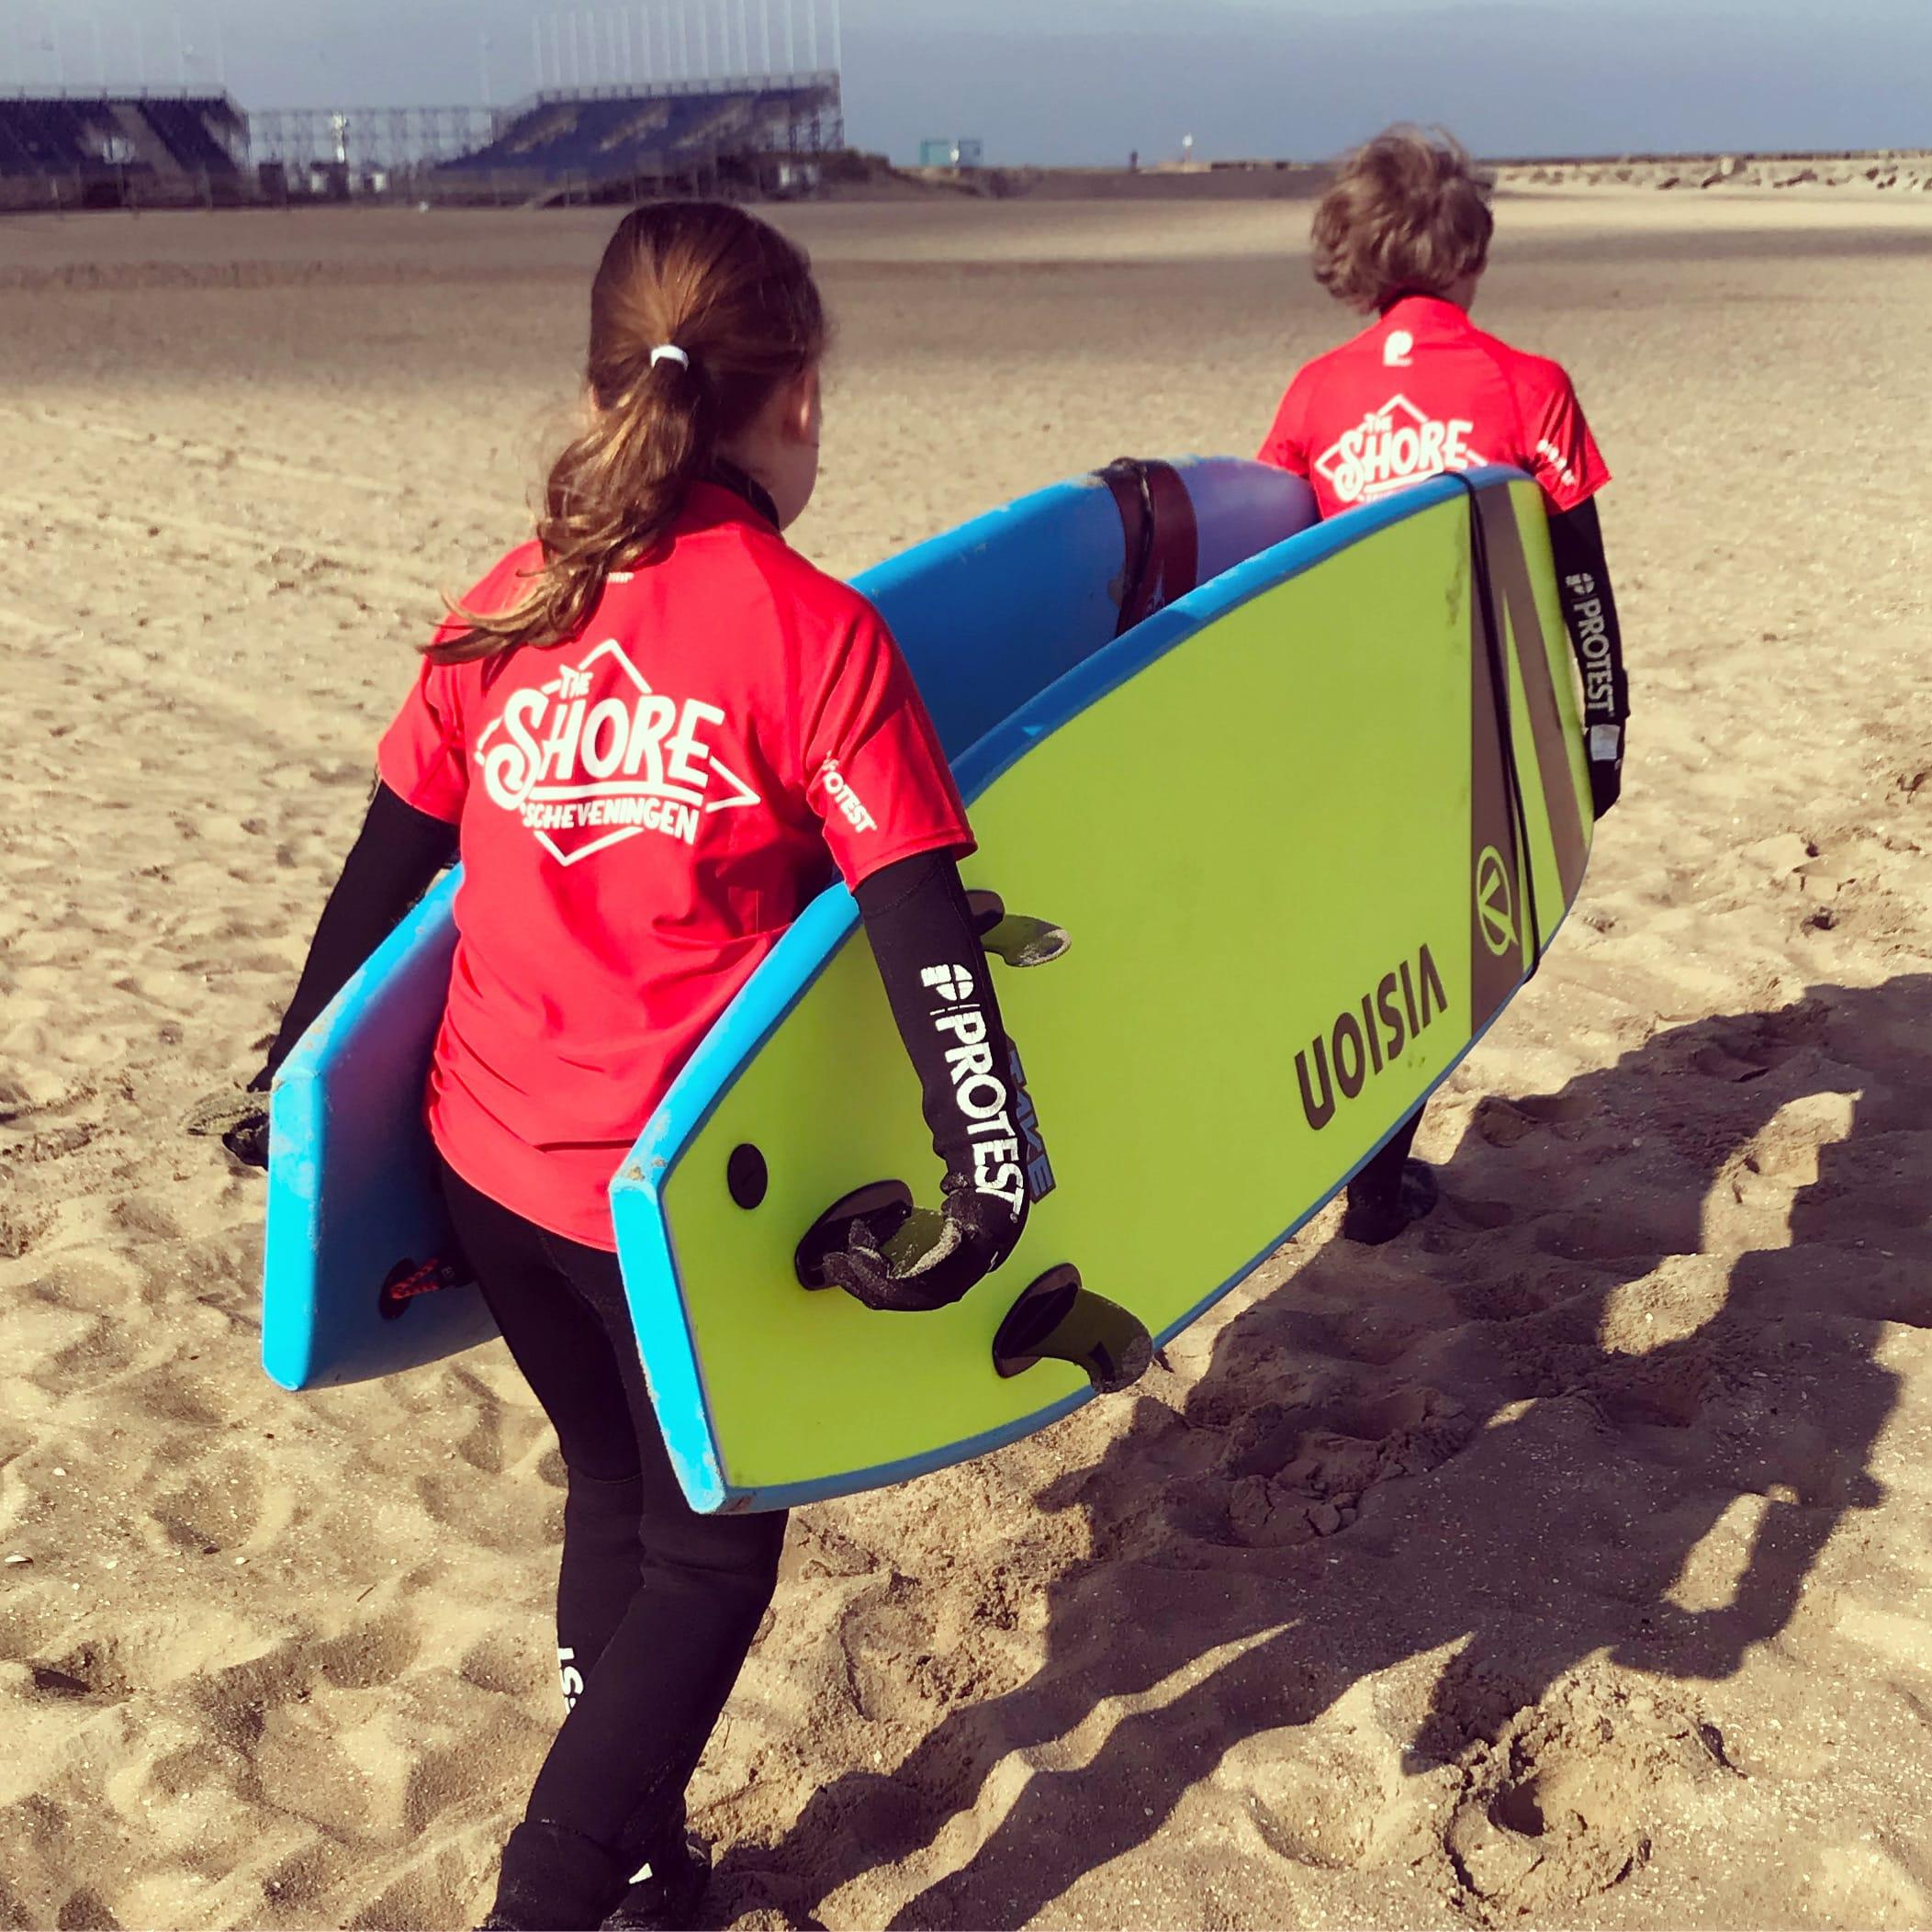 Action Academy (Surf kamp)